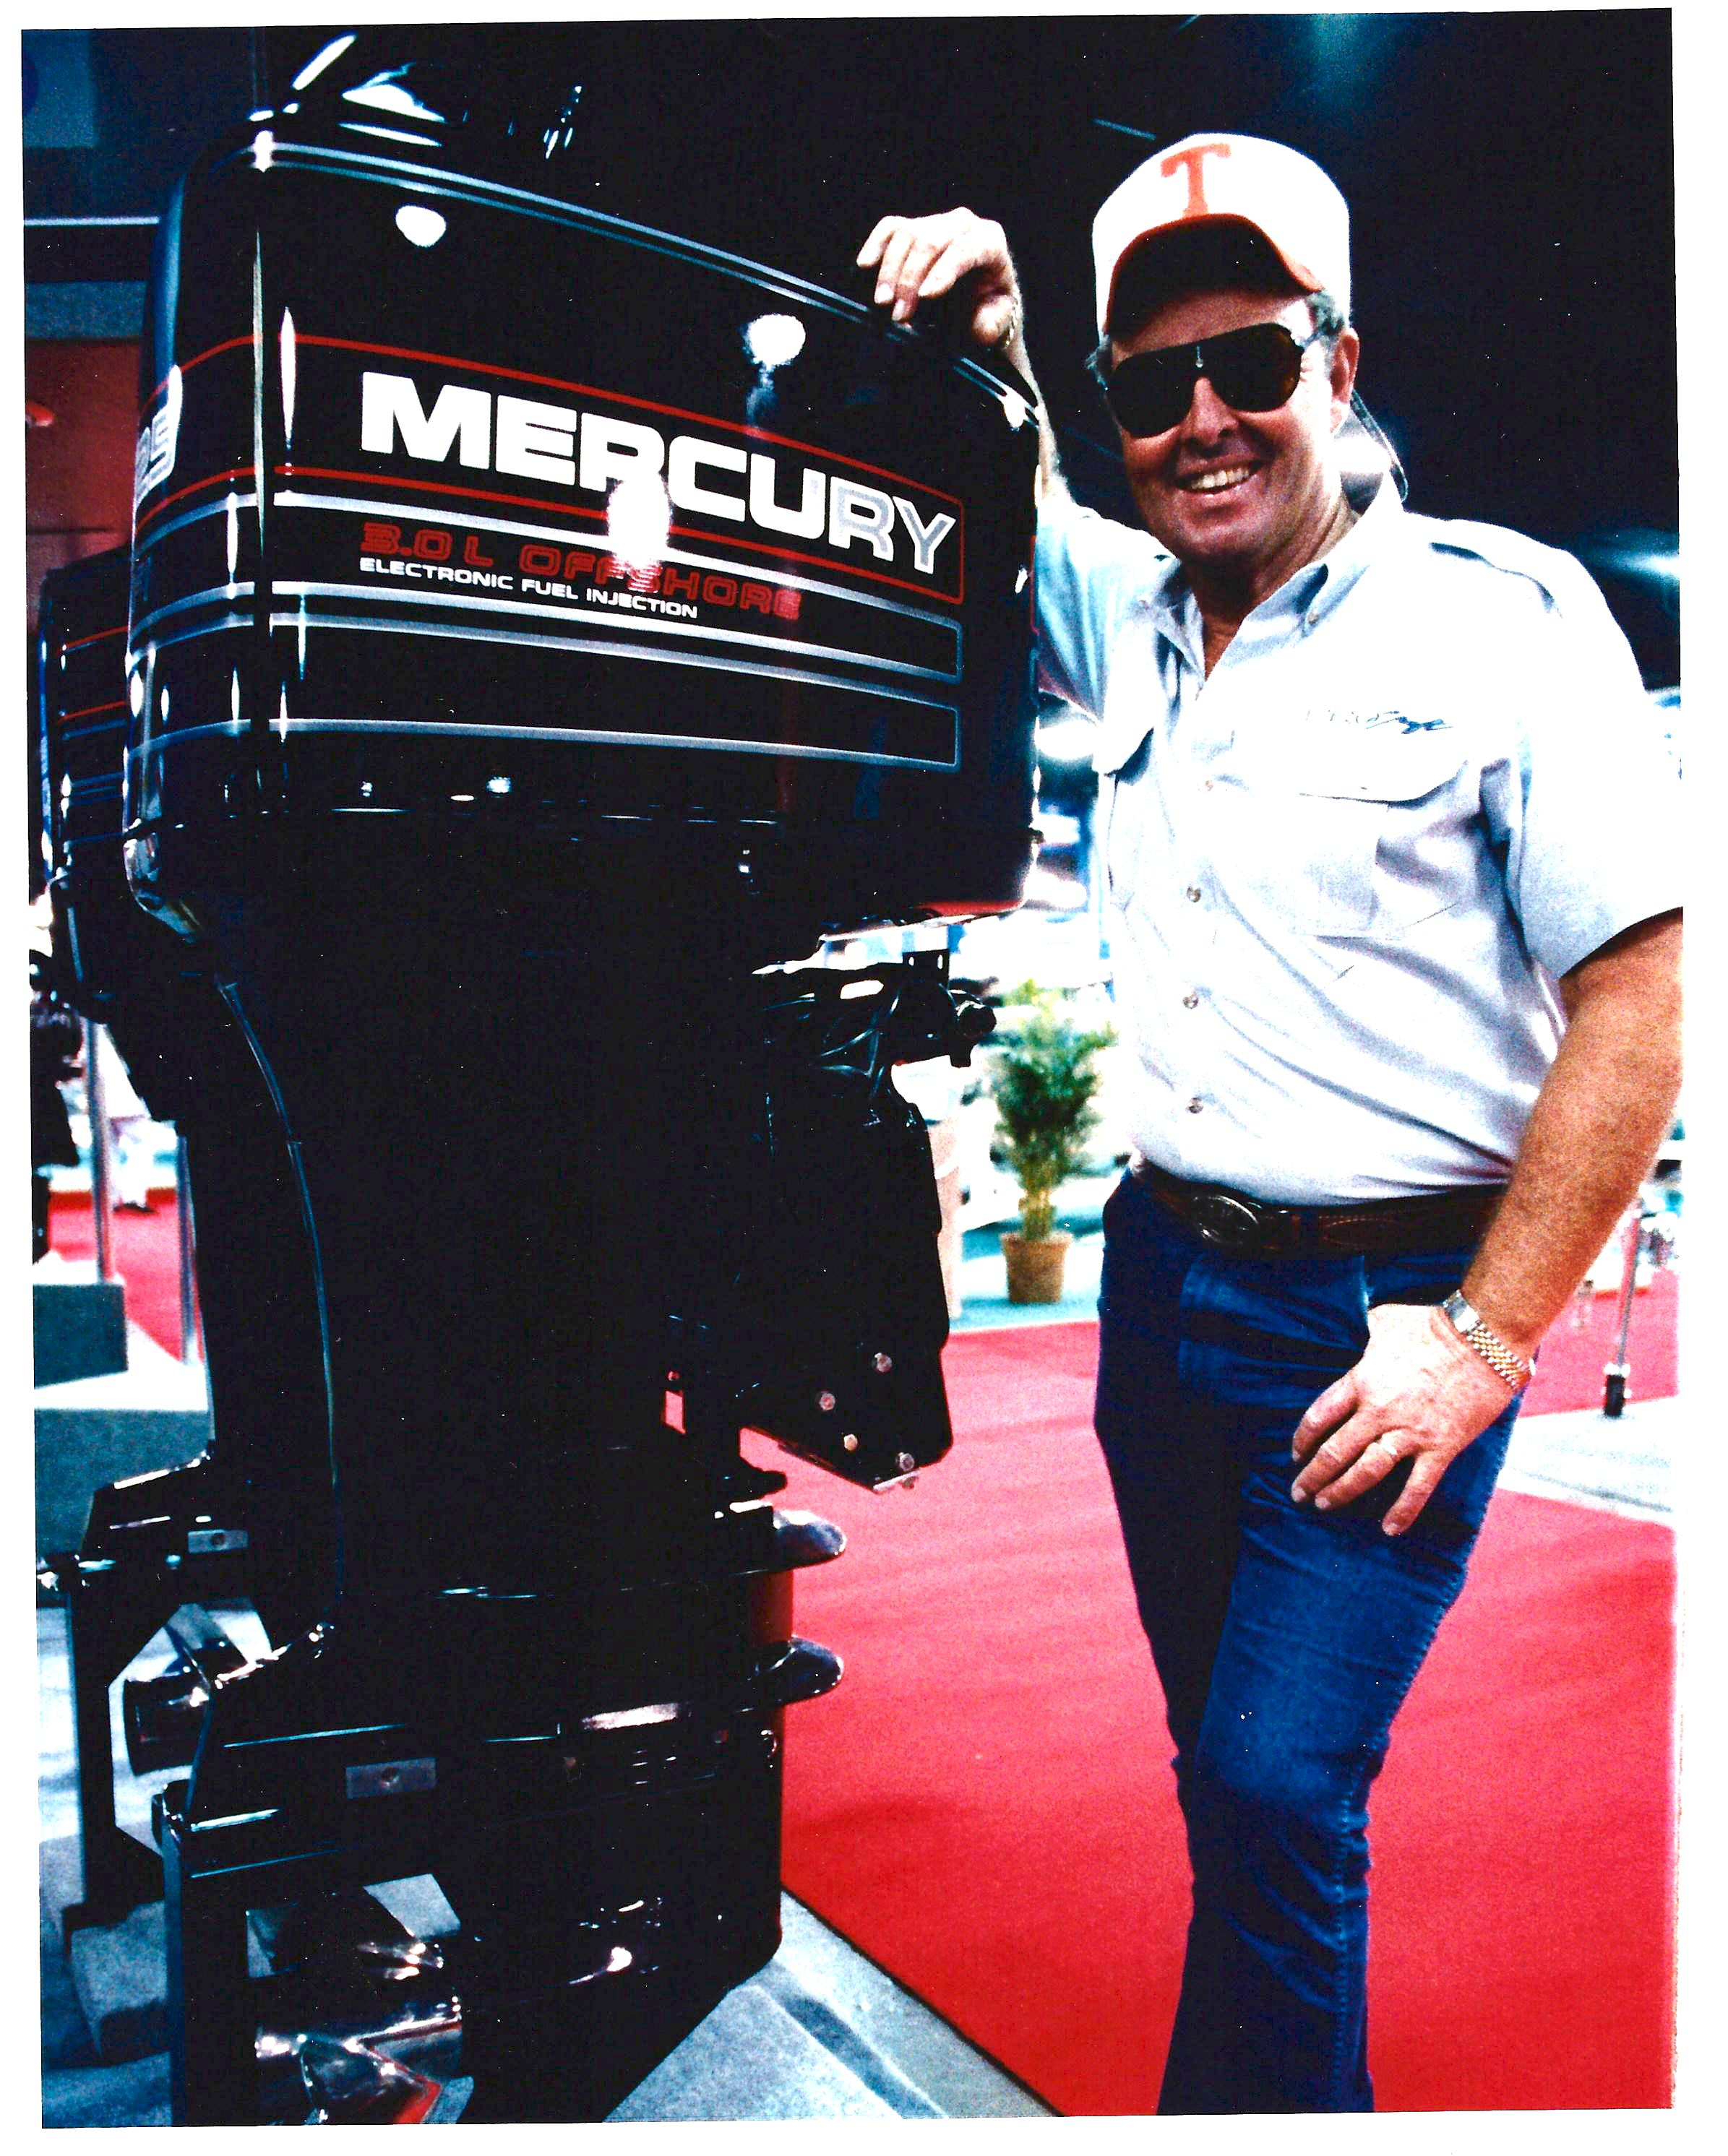 Bill Dance with Mercury